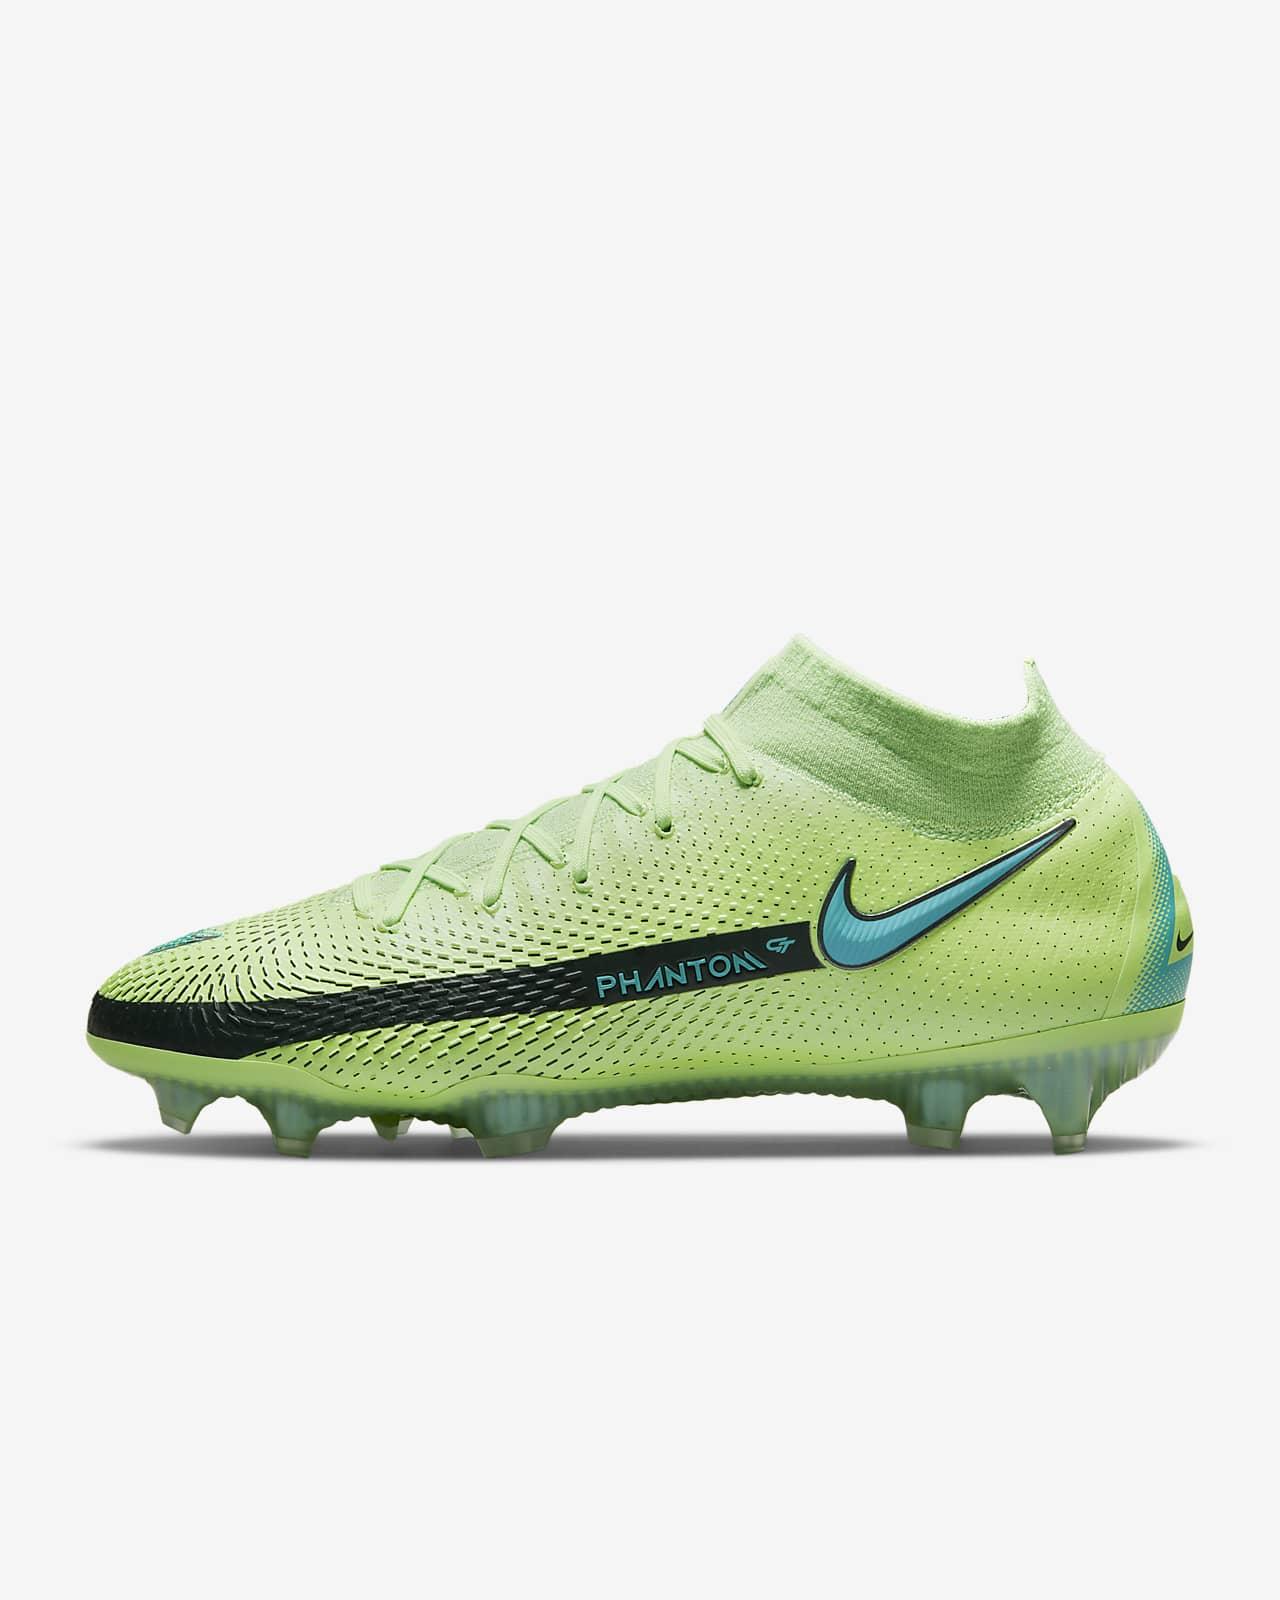 Calzado de fútbol para terreno firme Nike Phantom GT Elite Dynamic Fit FG